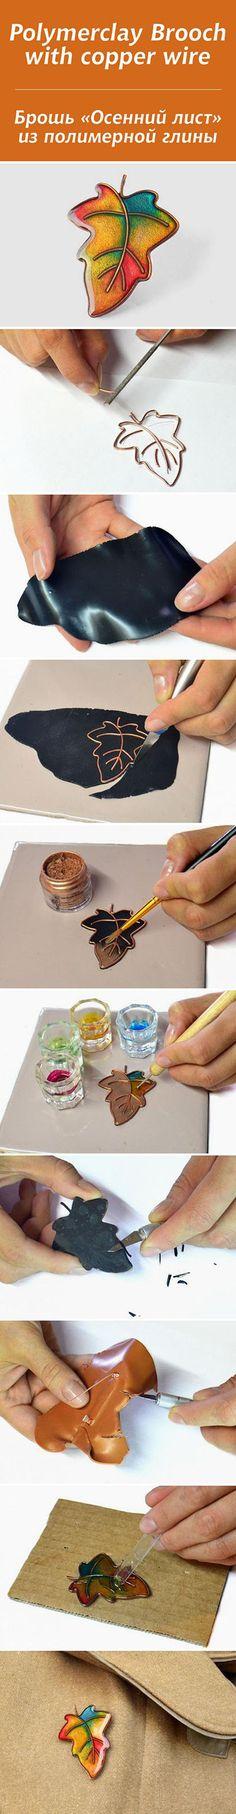 Polymer clay Brooch with copper wire   DIY & Crafts Tutorials